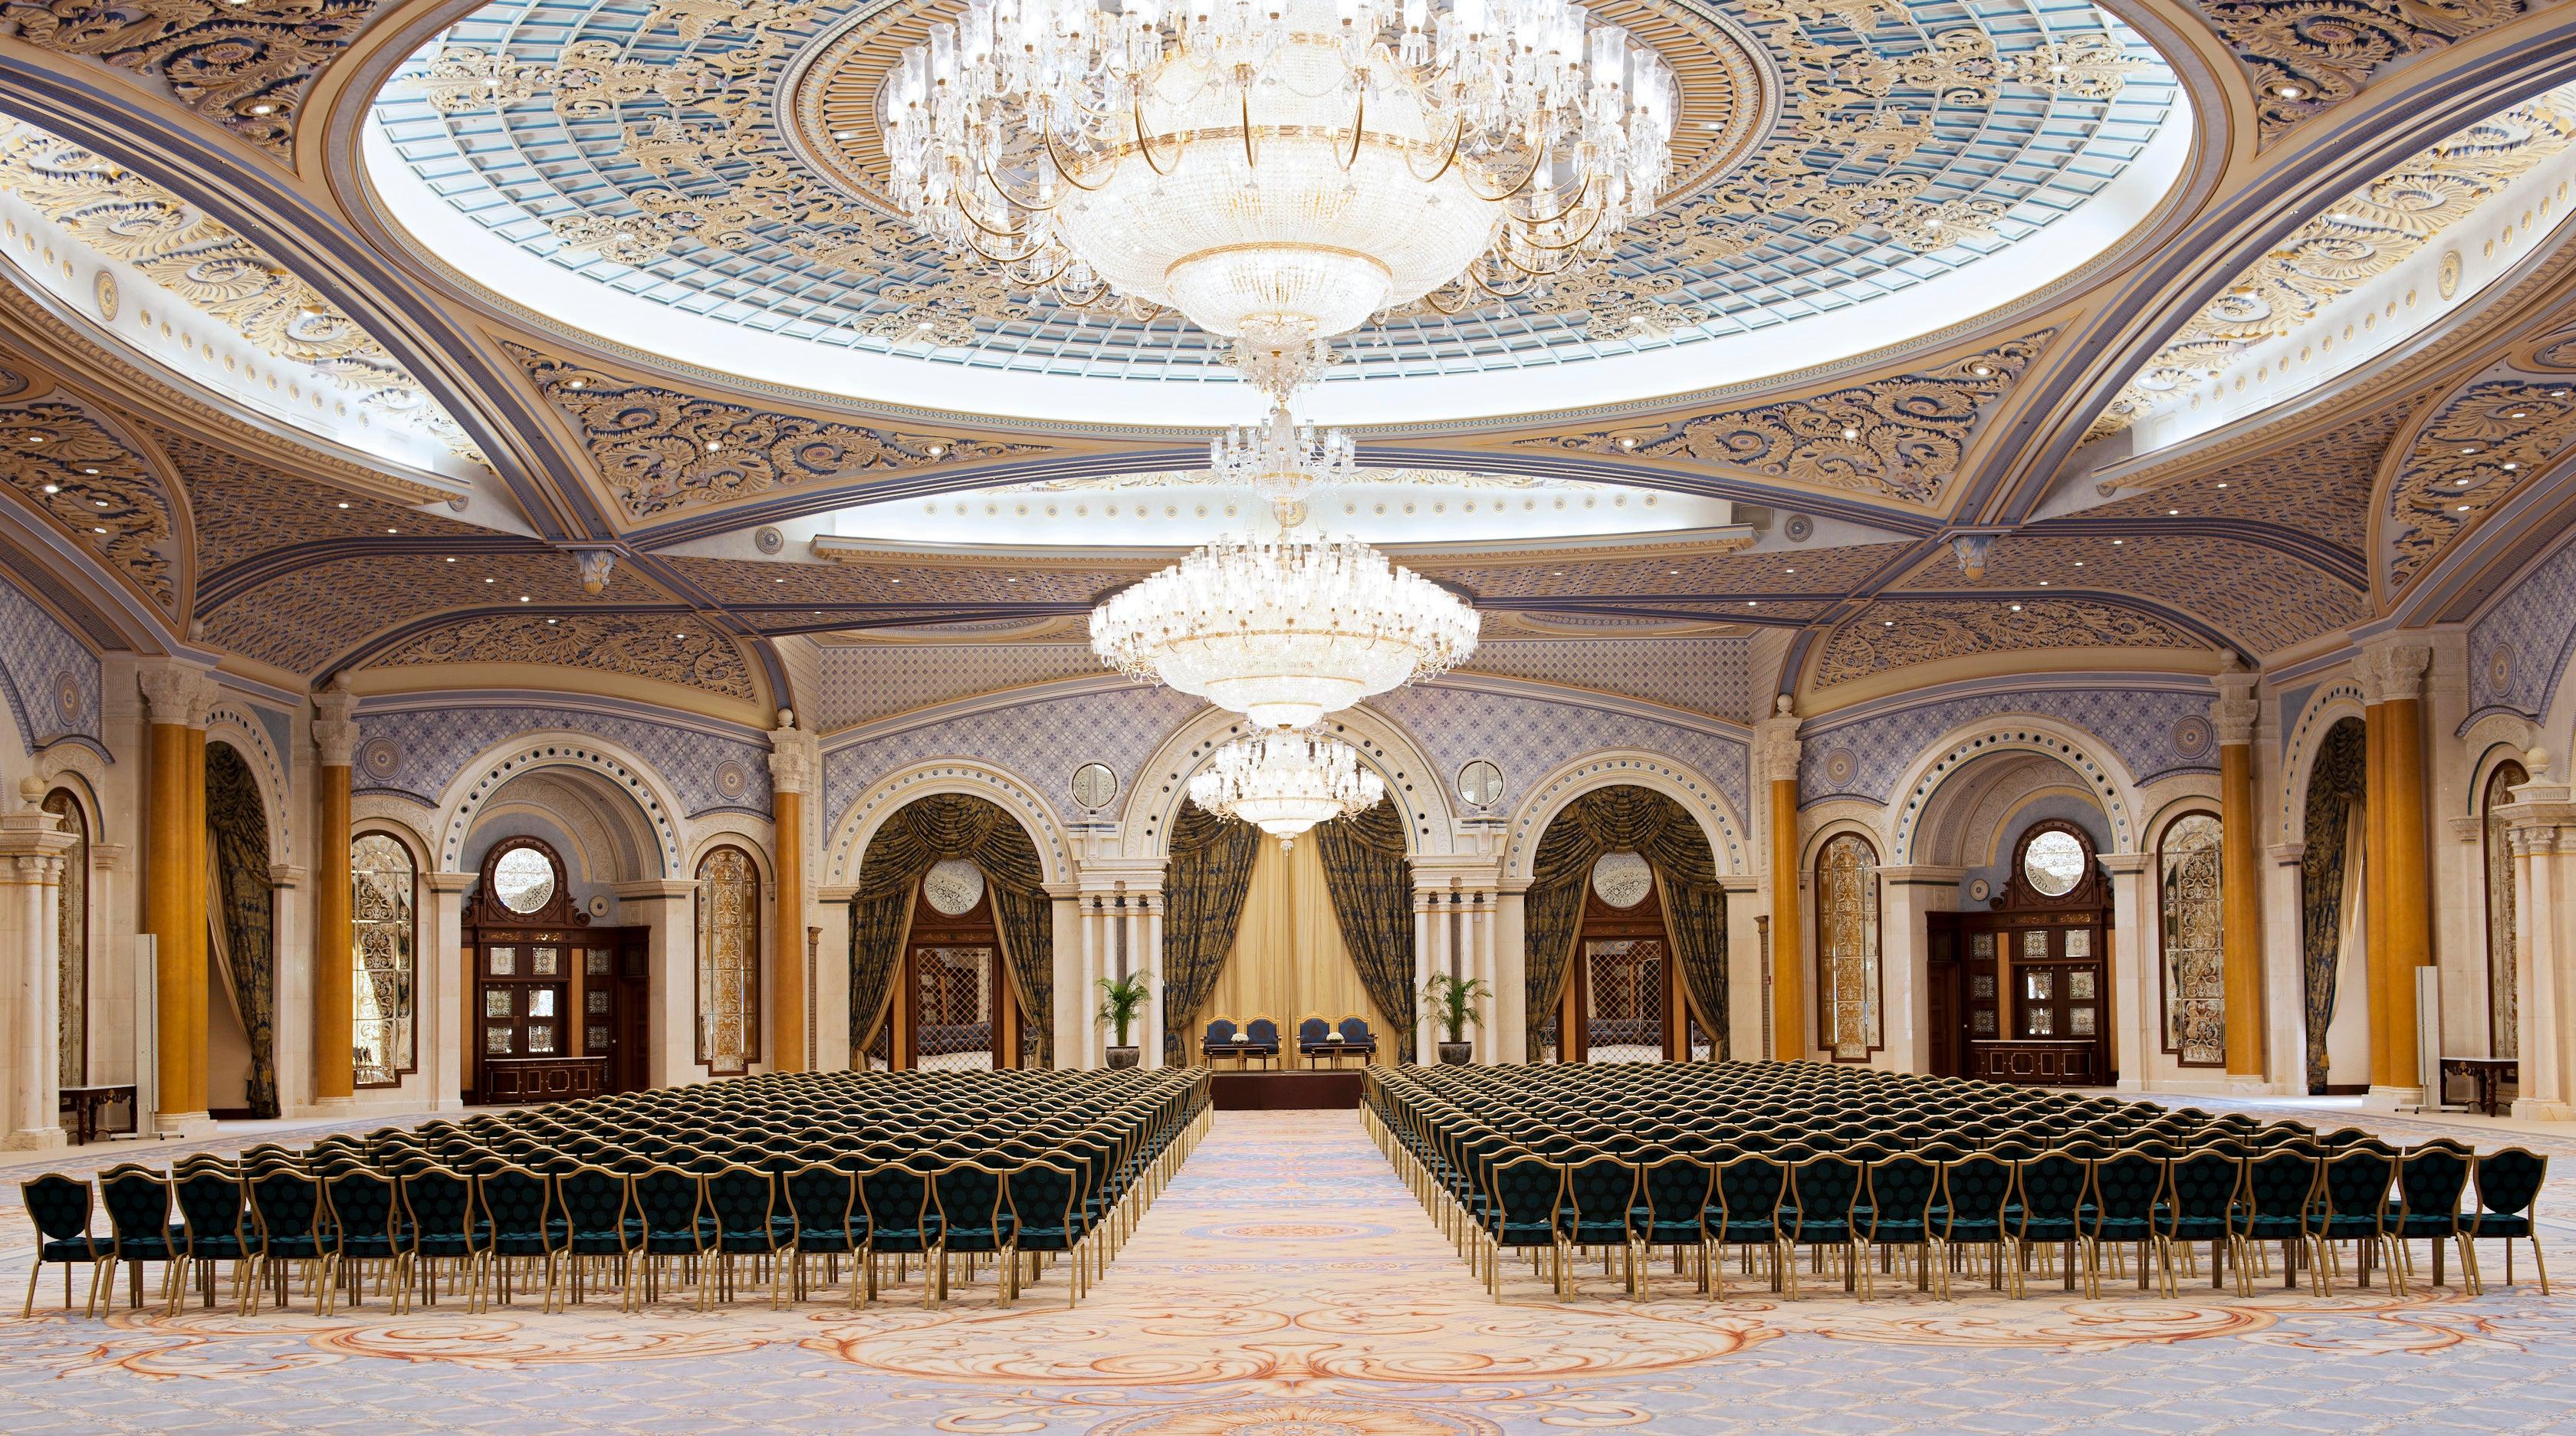 Image Credit The Ritz Carlton Riyadh